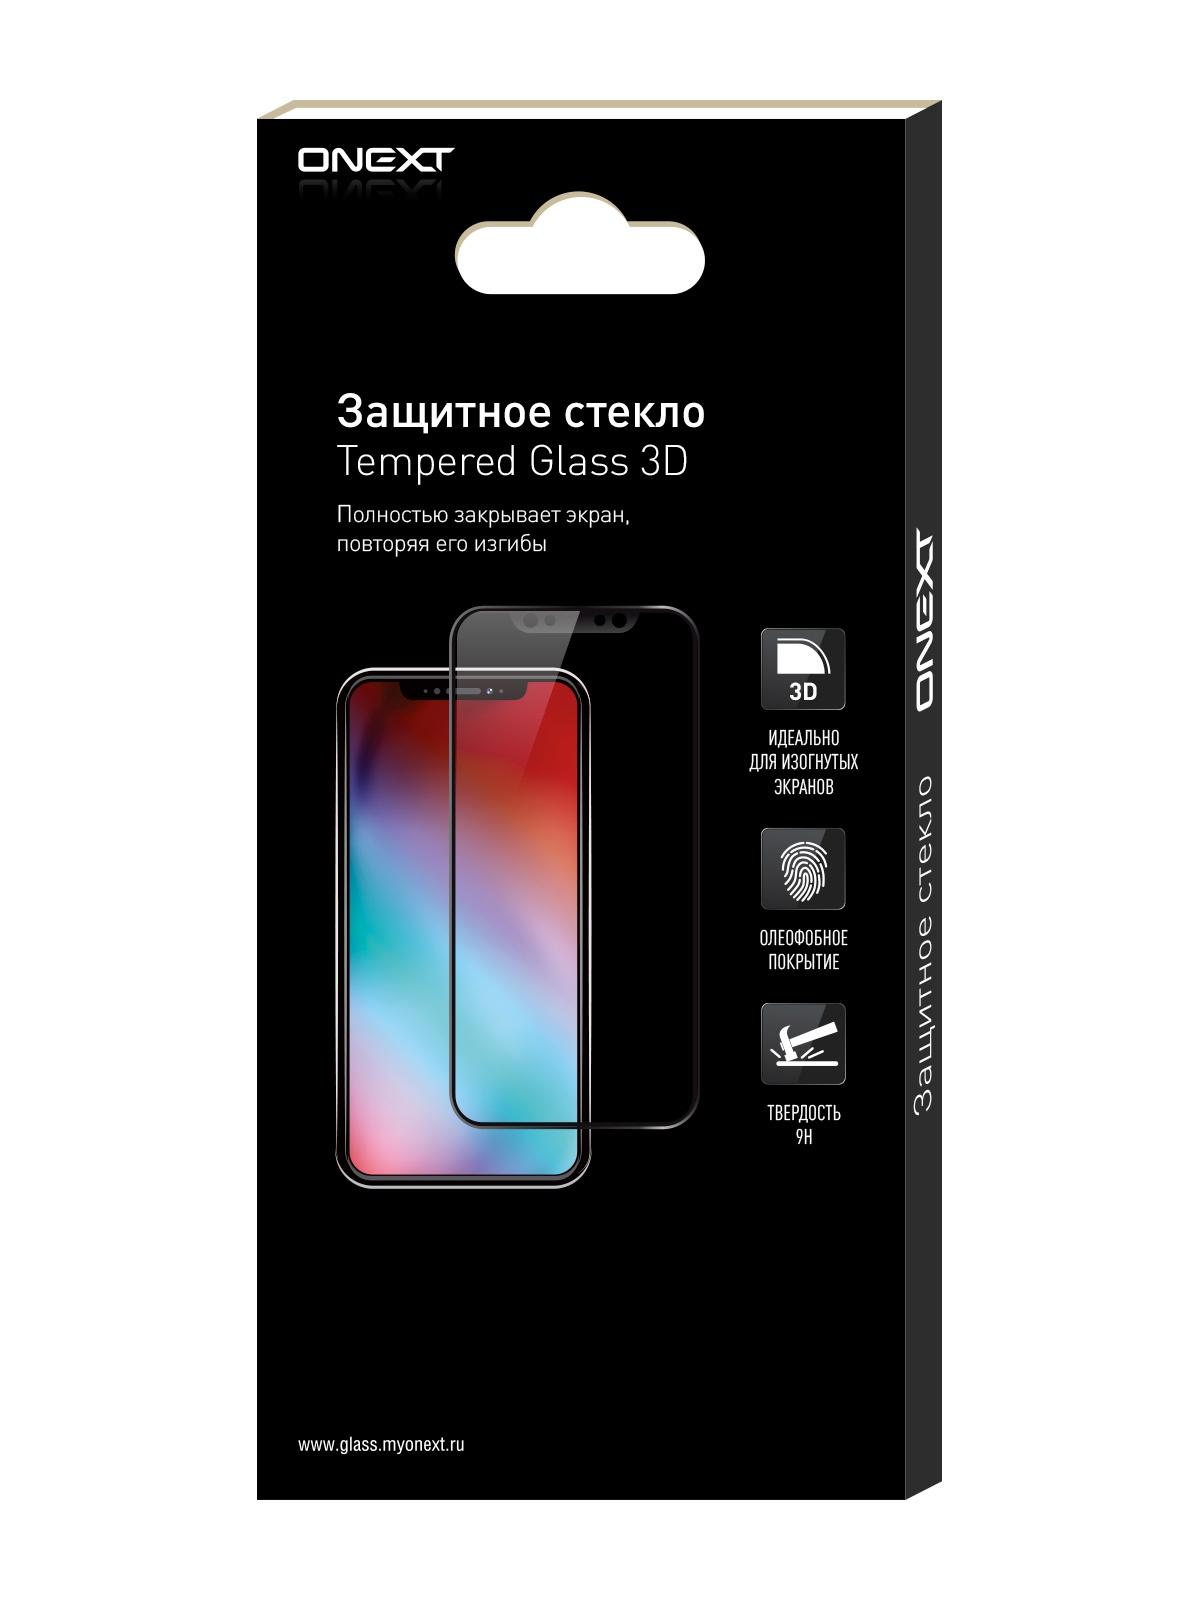 Защитное стекло ONEXT iPhone 7 3D защитное стекло onext для iphone 7